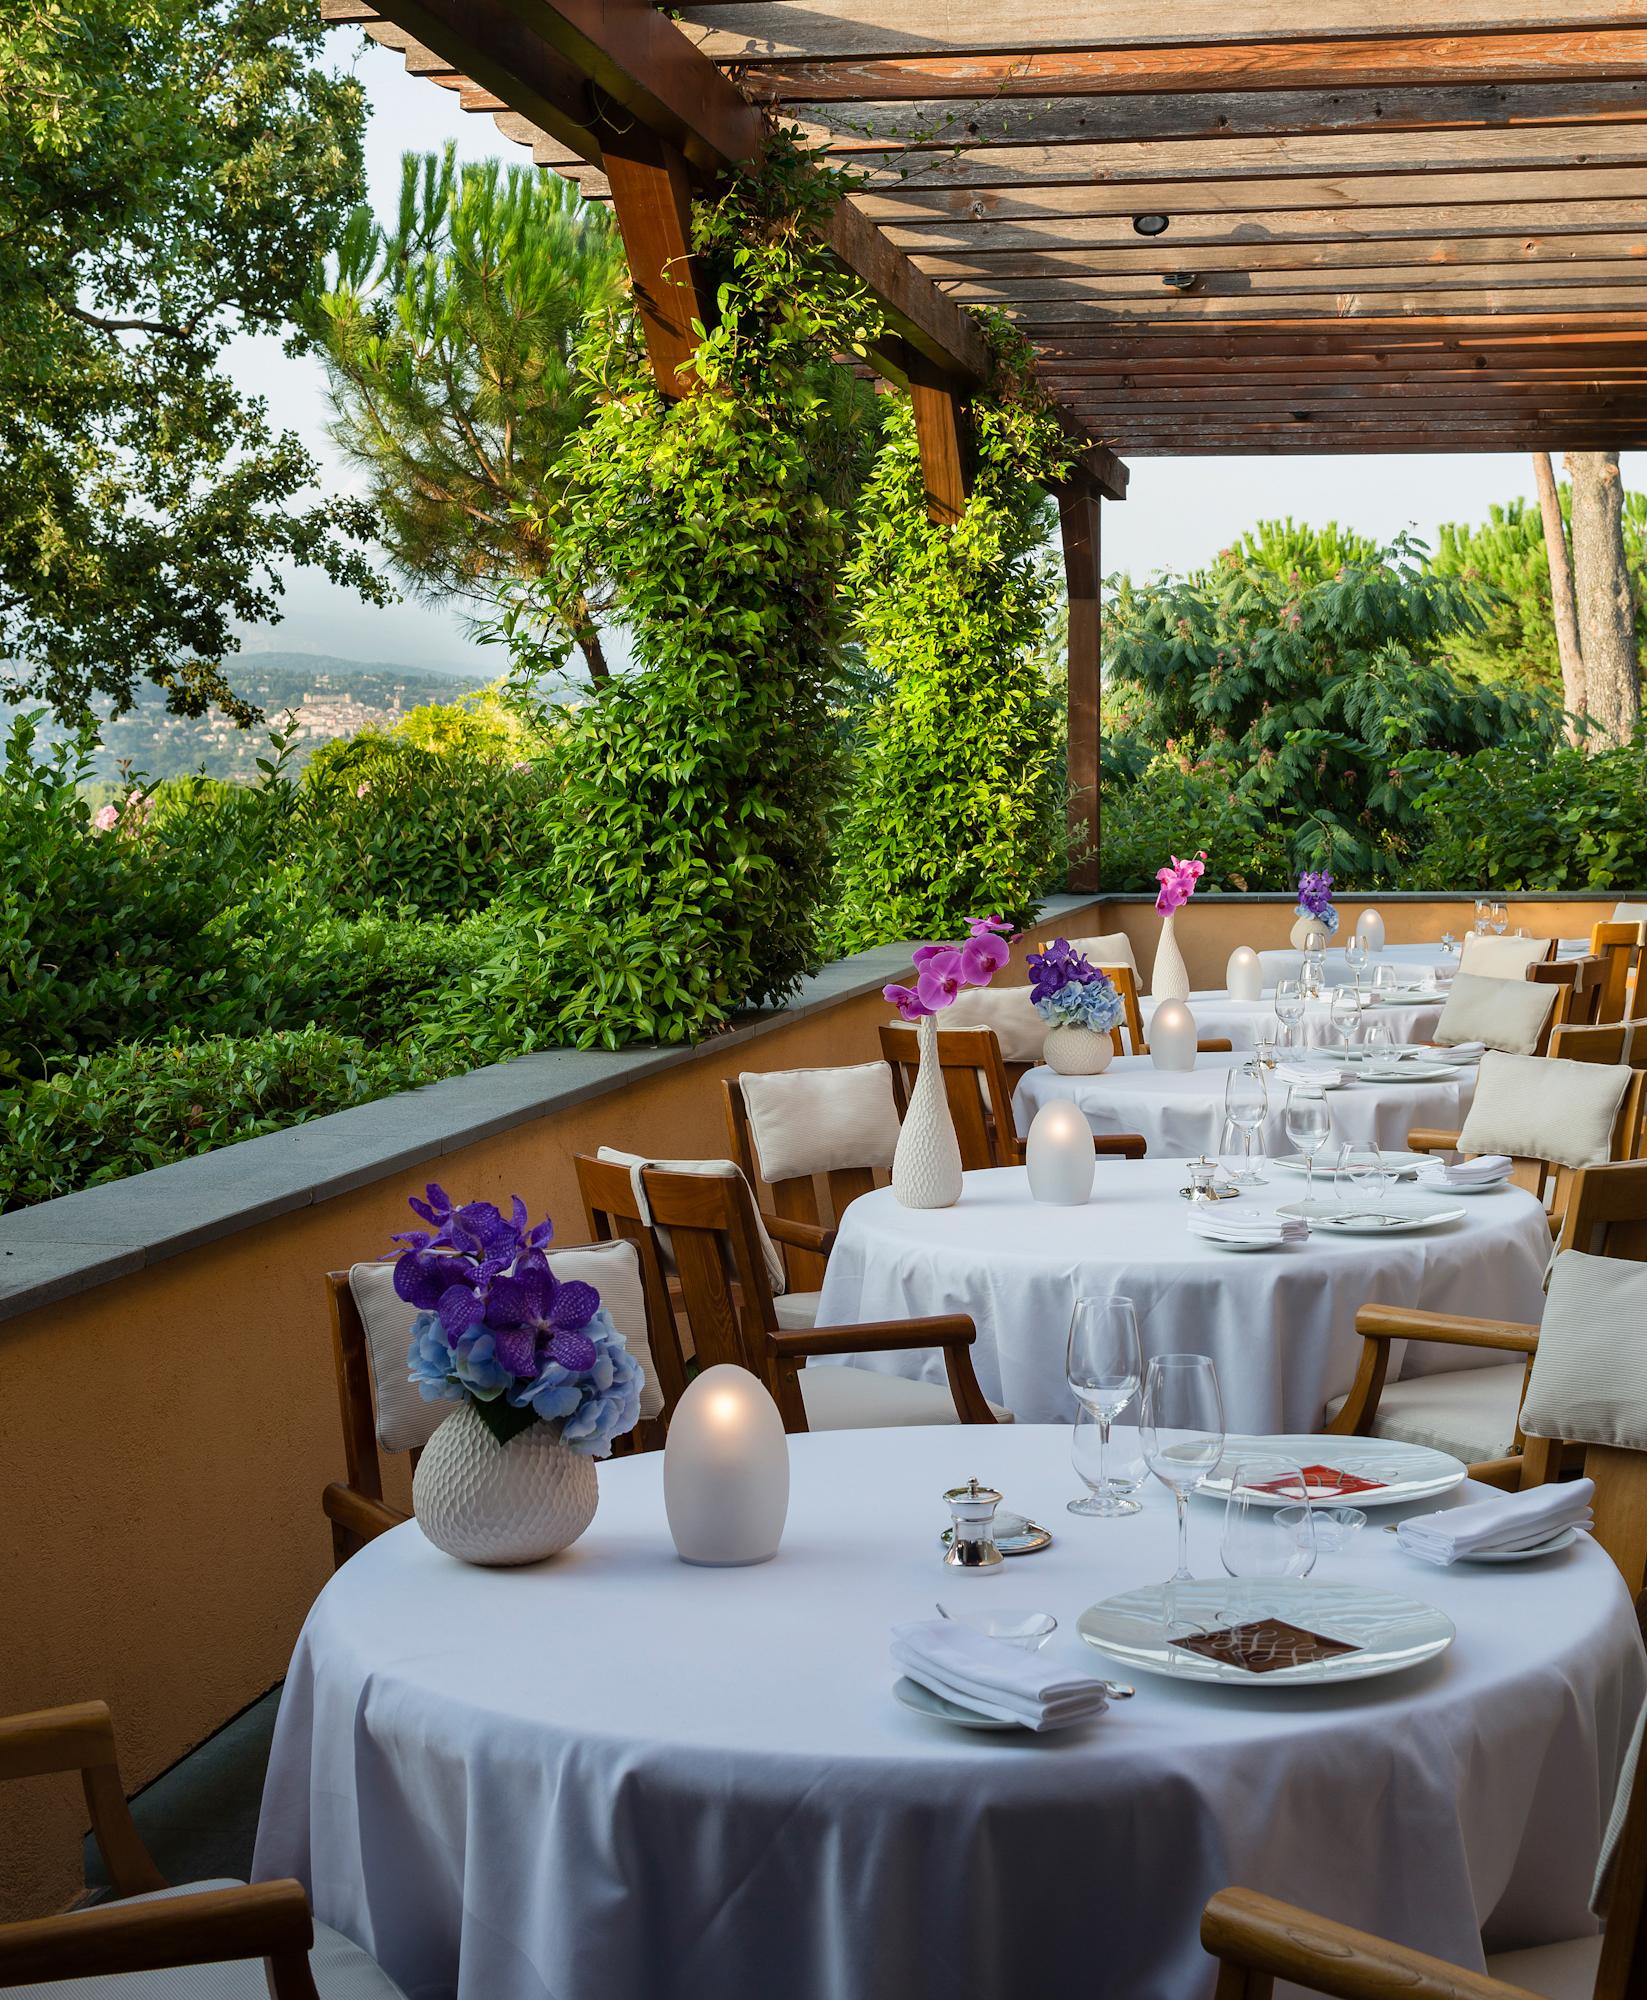 Restaurant-Faventia-Terre-Blanche (11).jpg